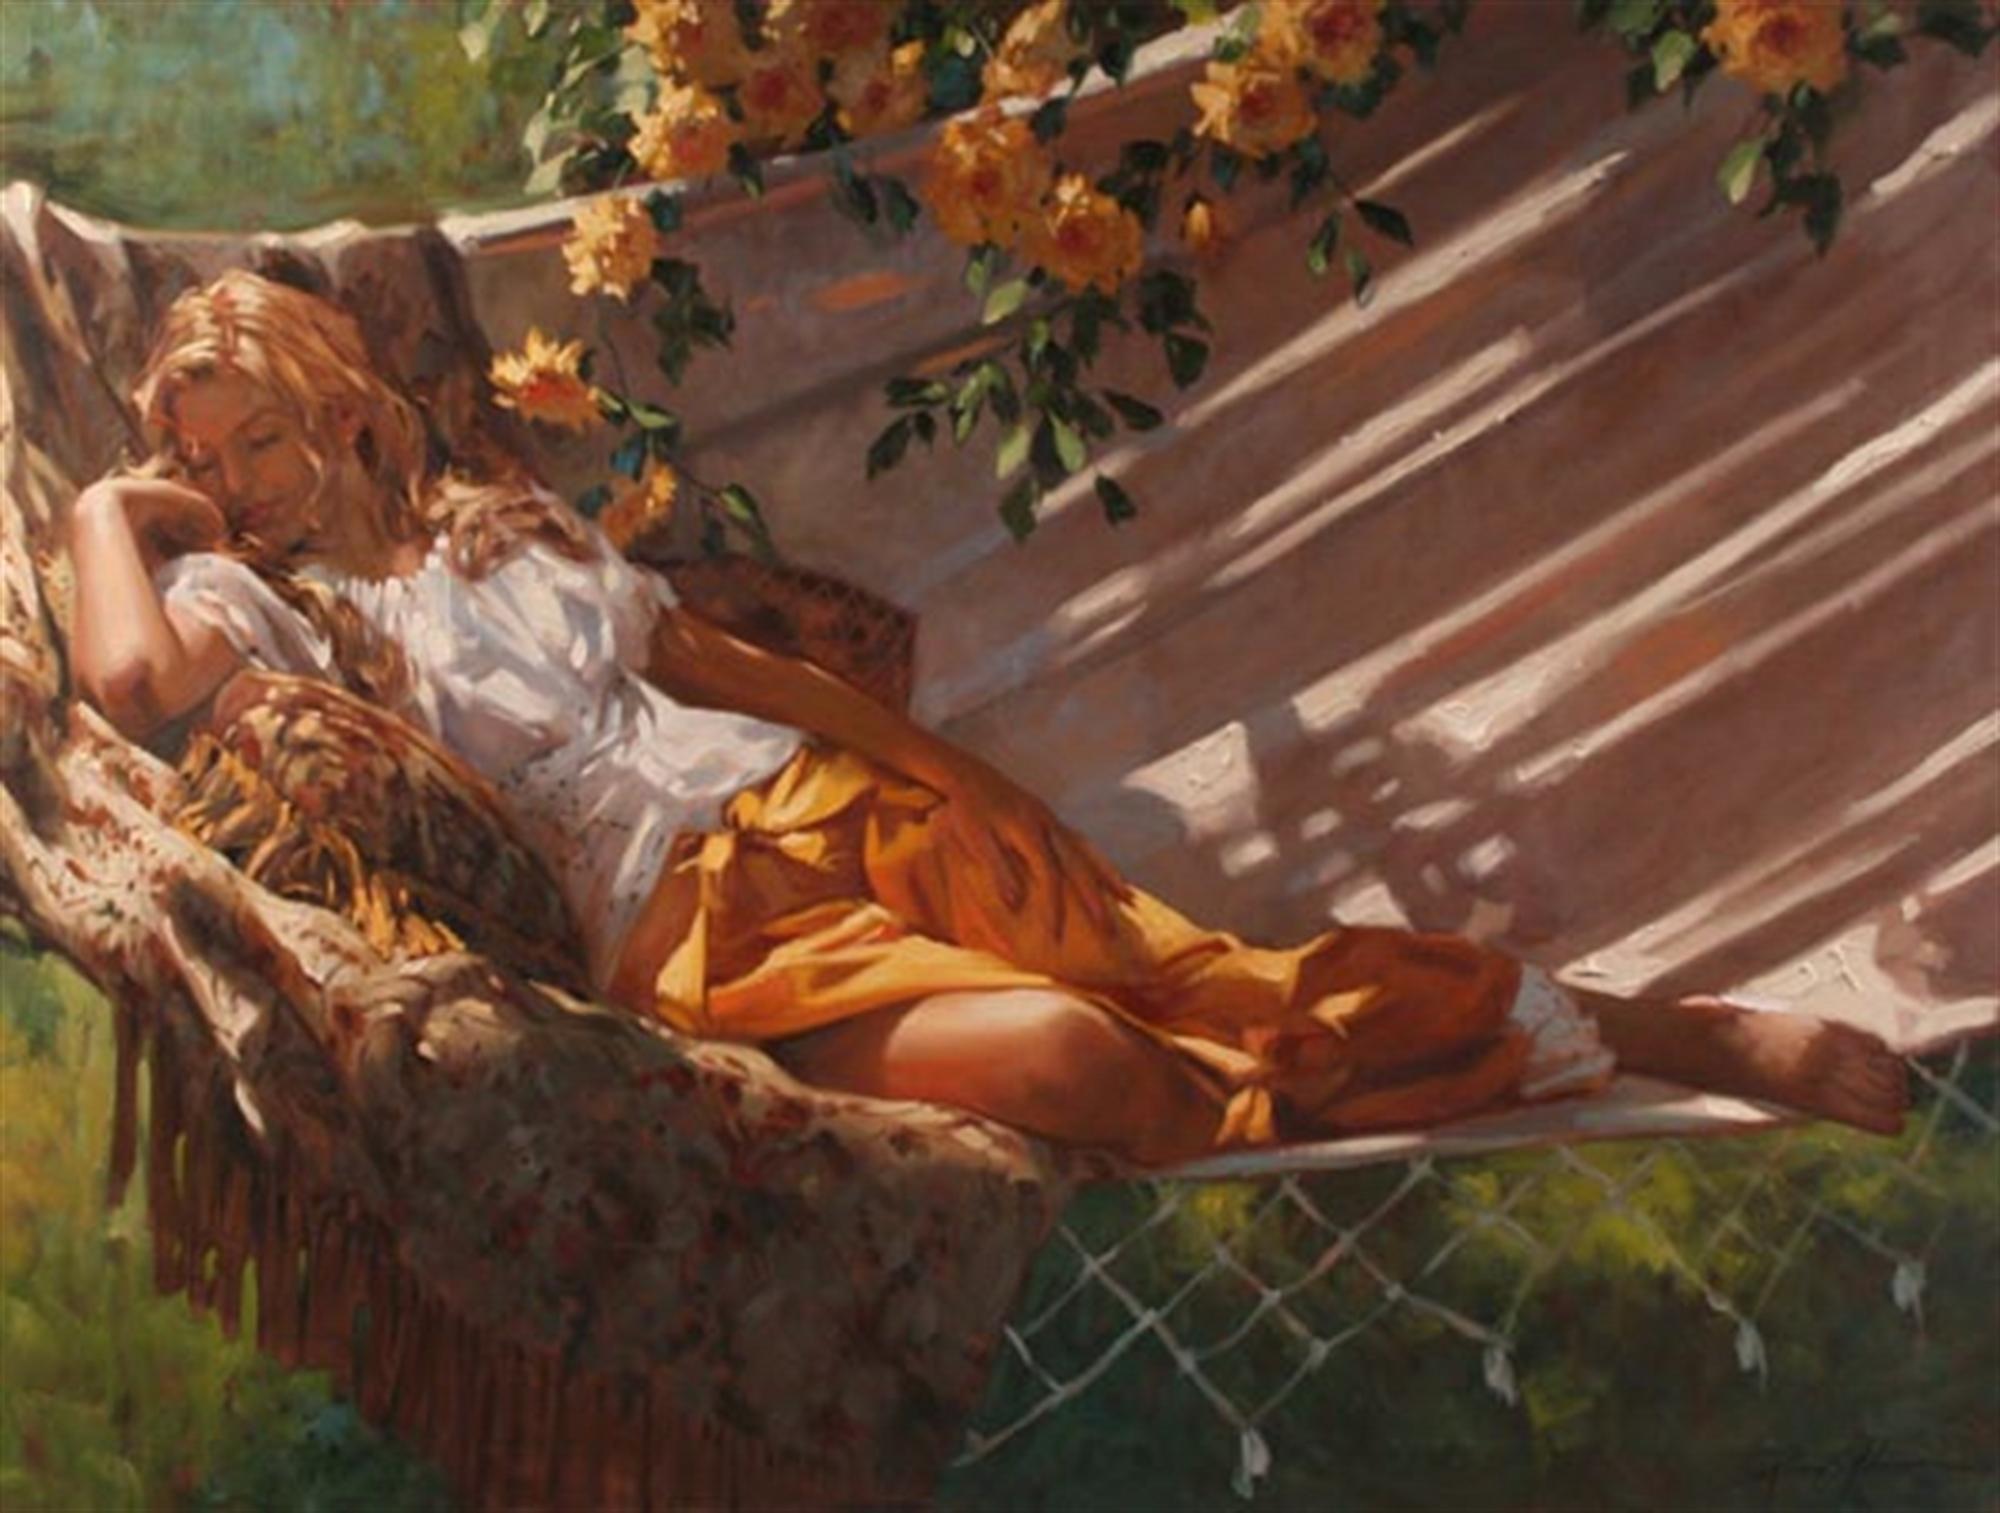 Golden Dreams by Richard Johnson